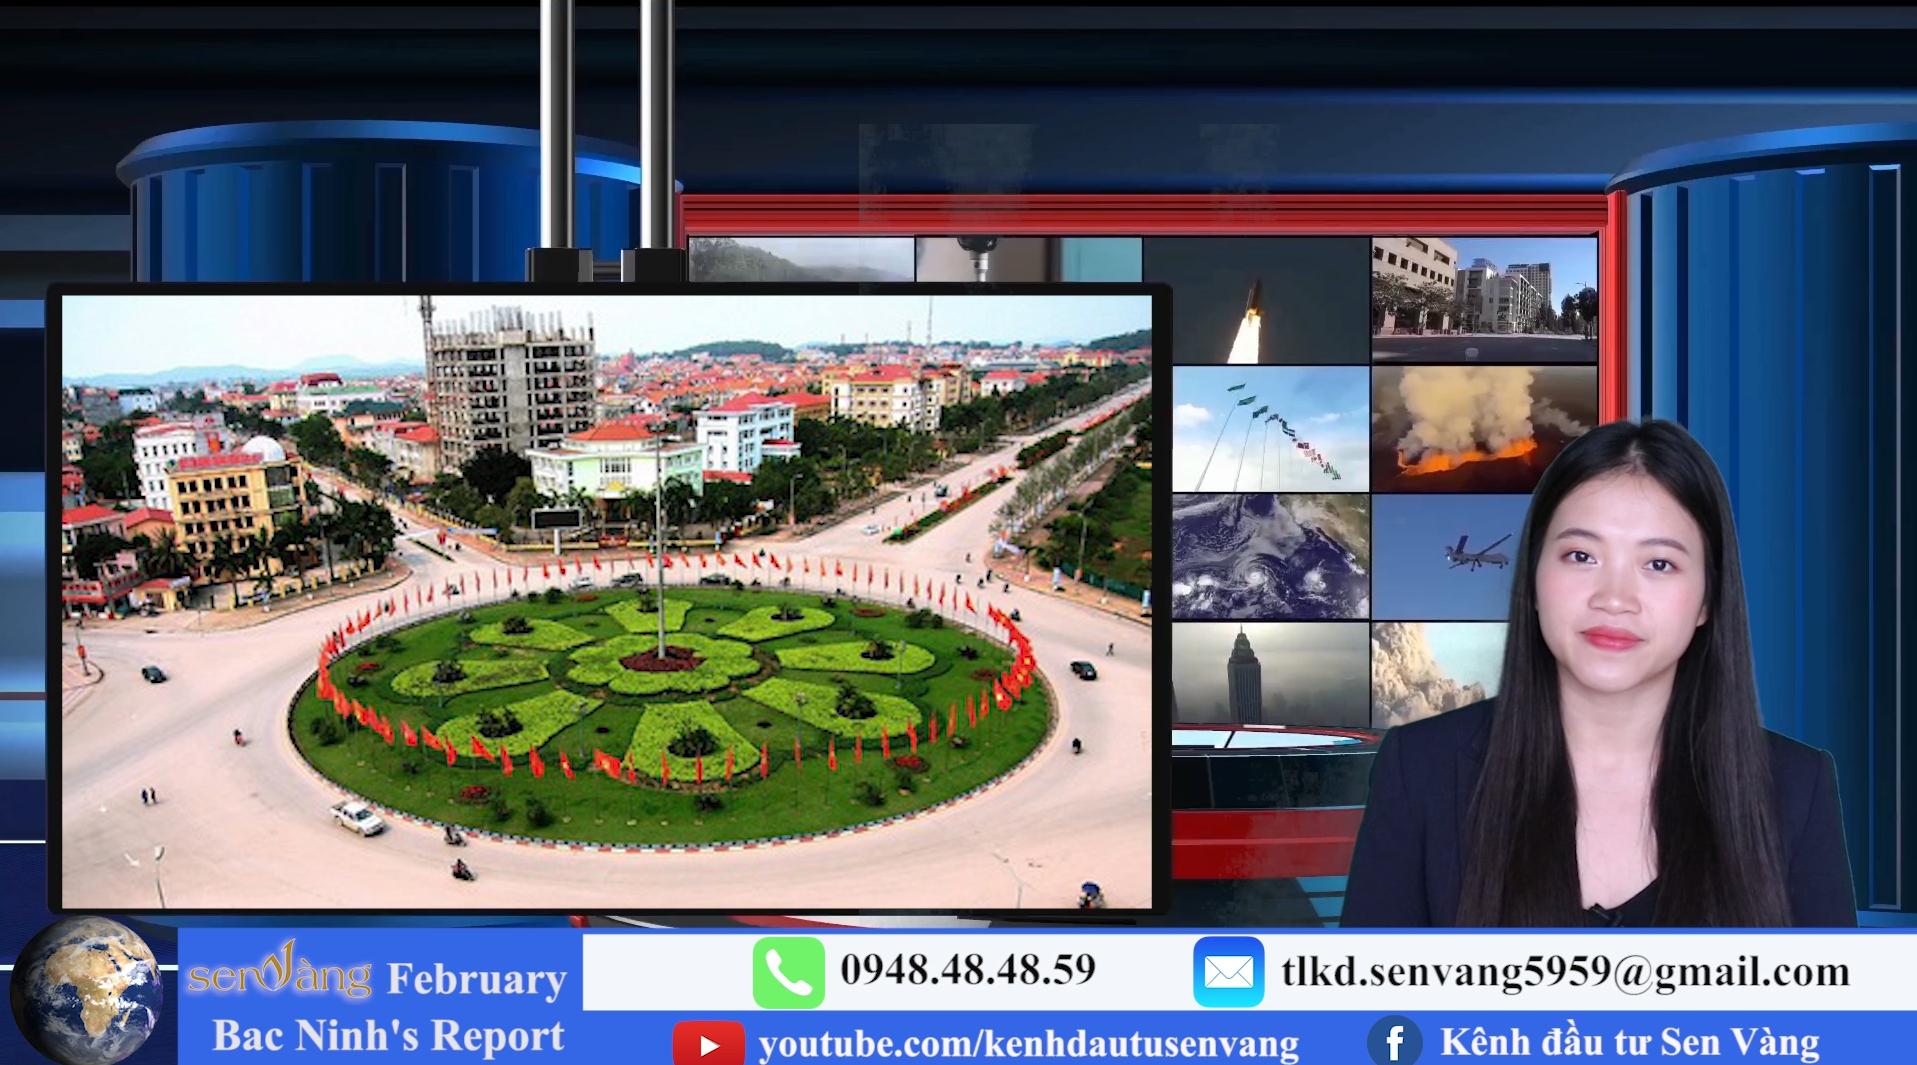 Bac Ninh's Real Estate Report February 2021